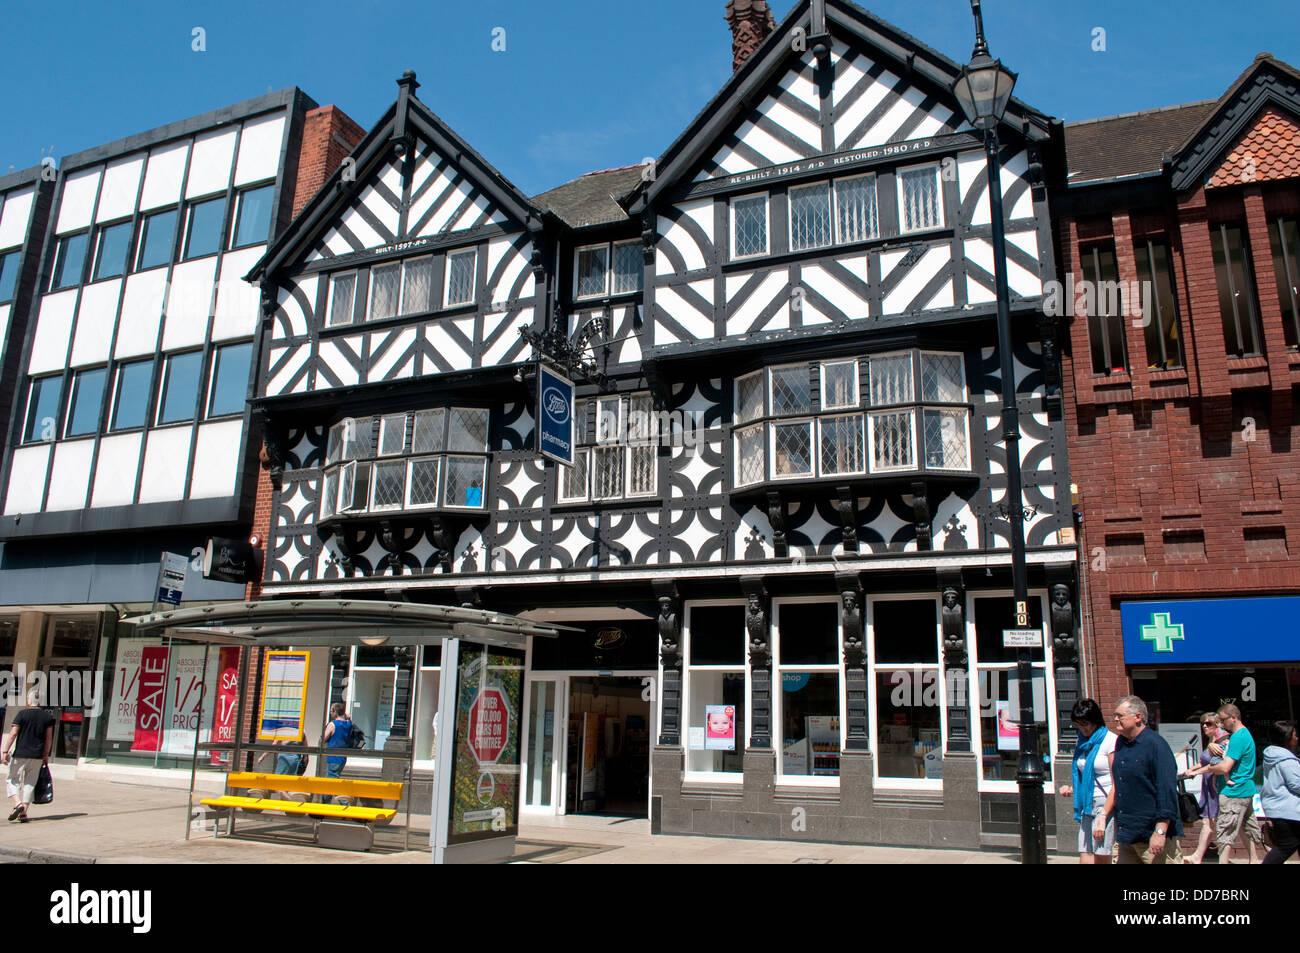 Tudor Architecture boots shop, mock tudor architecture, foregate street, chester